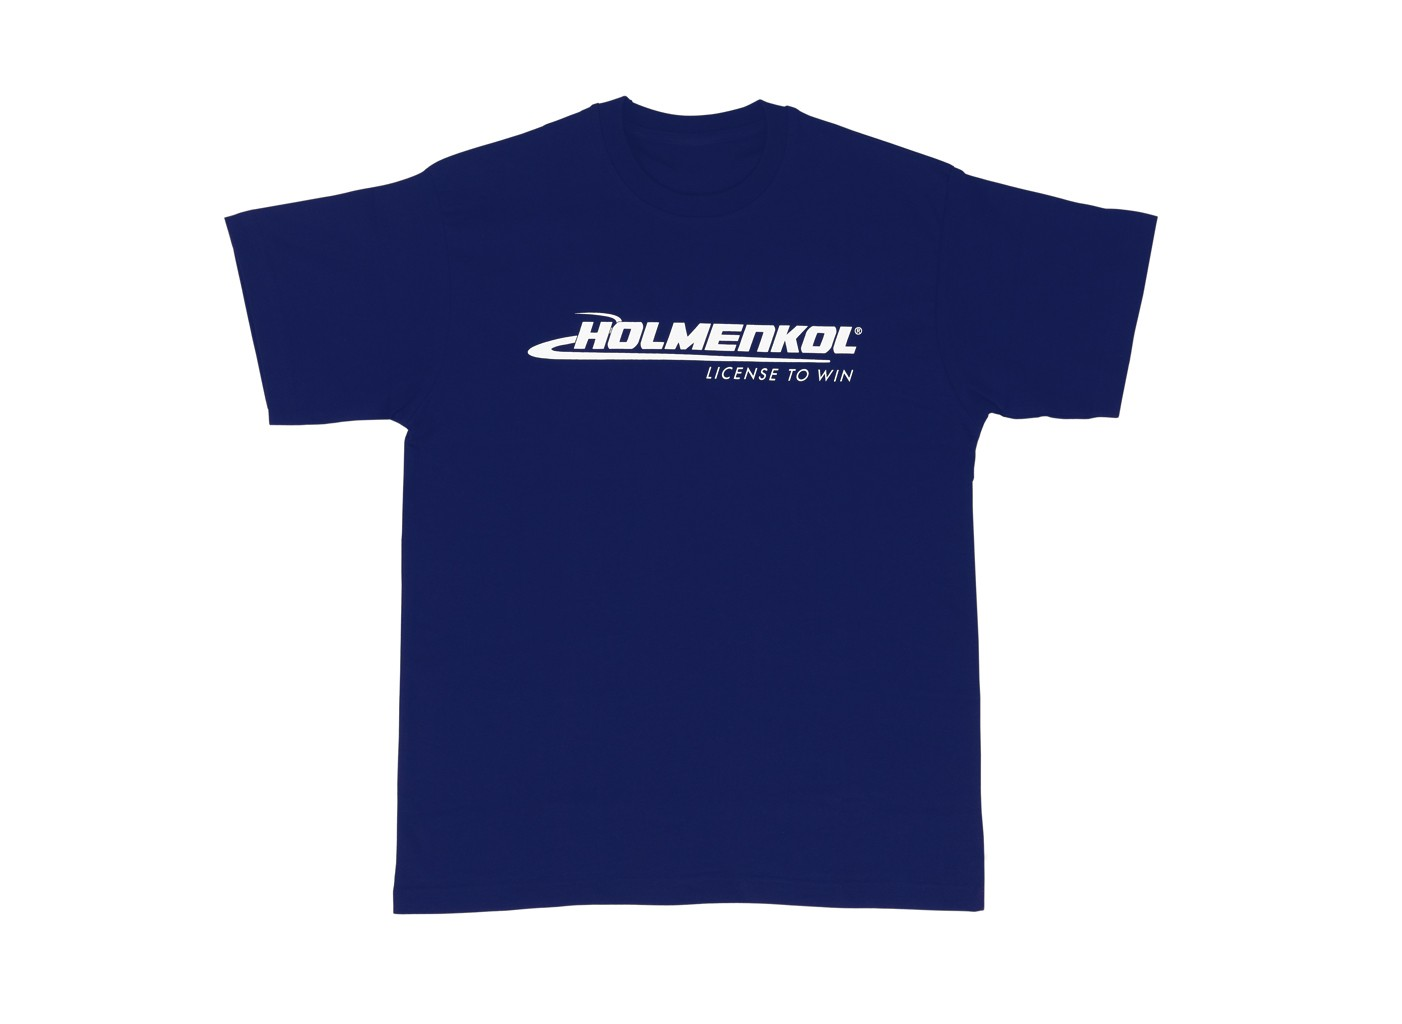 Holmenkol kratka majica